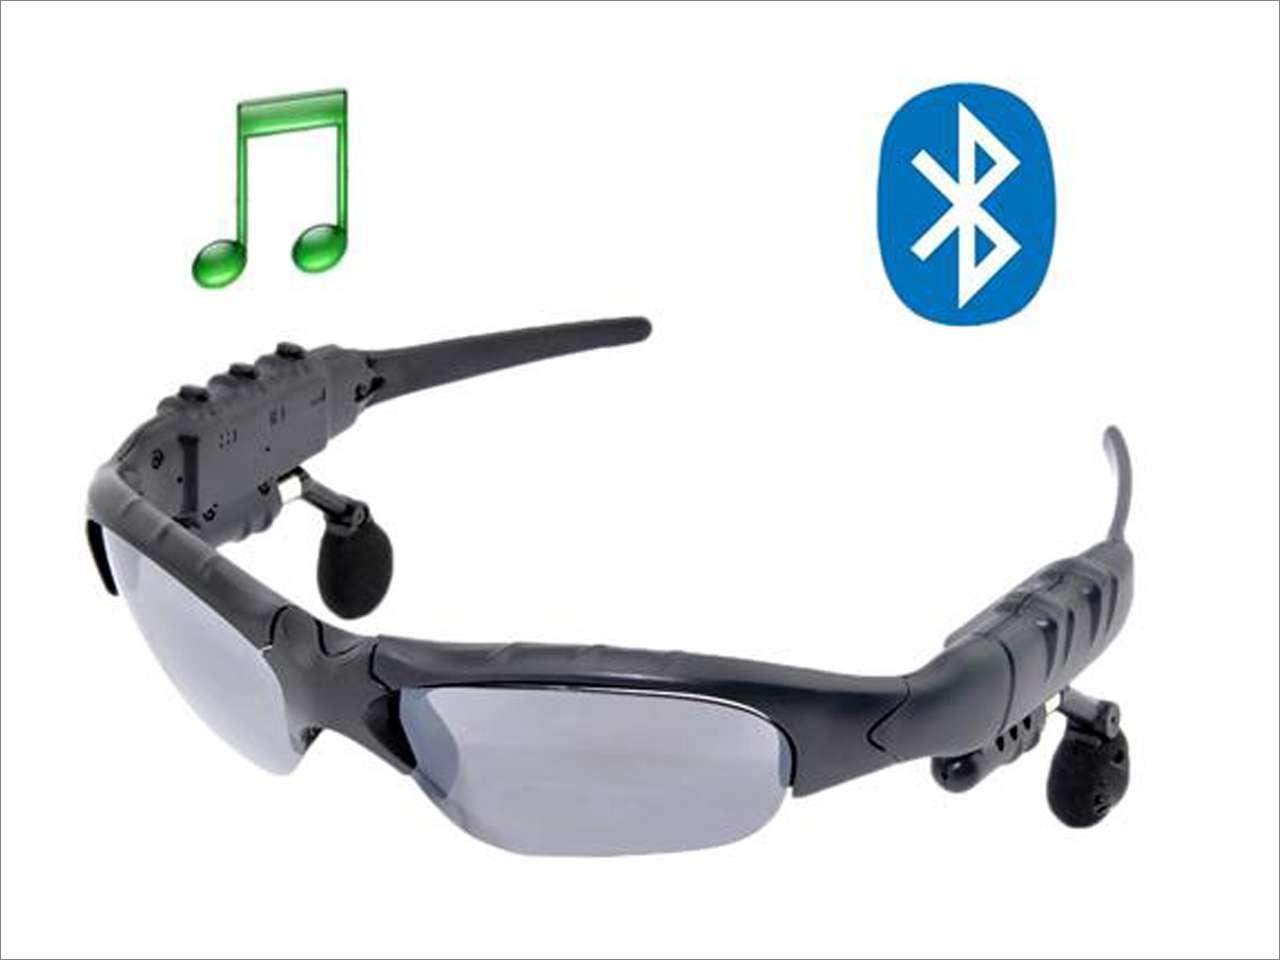 Patazon Bluetooth Sunglasses Stereo Headset Handfree For ...